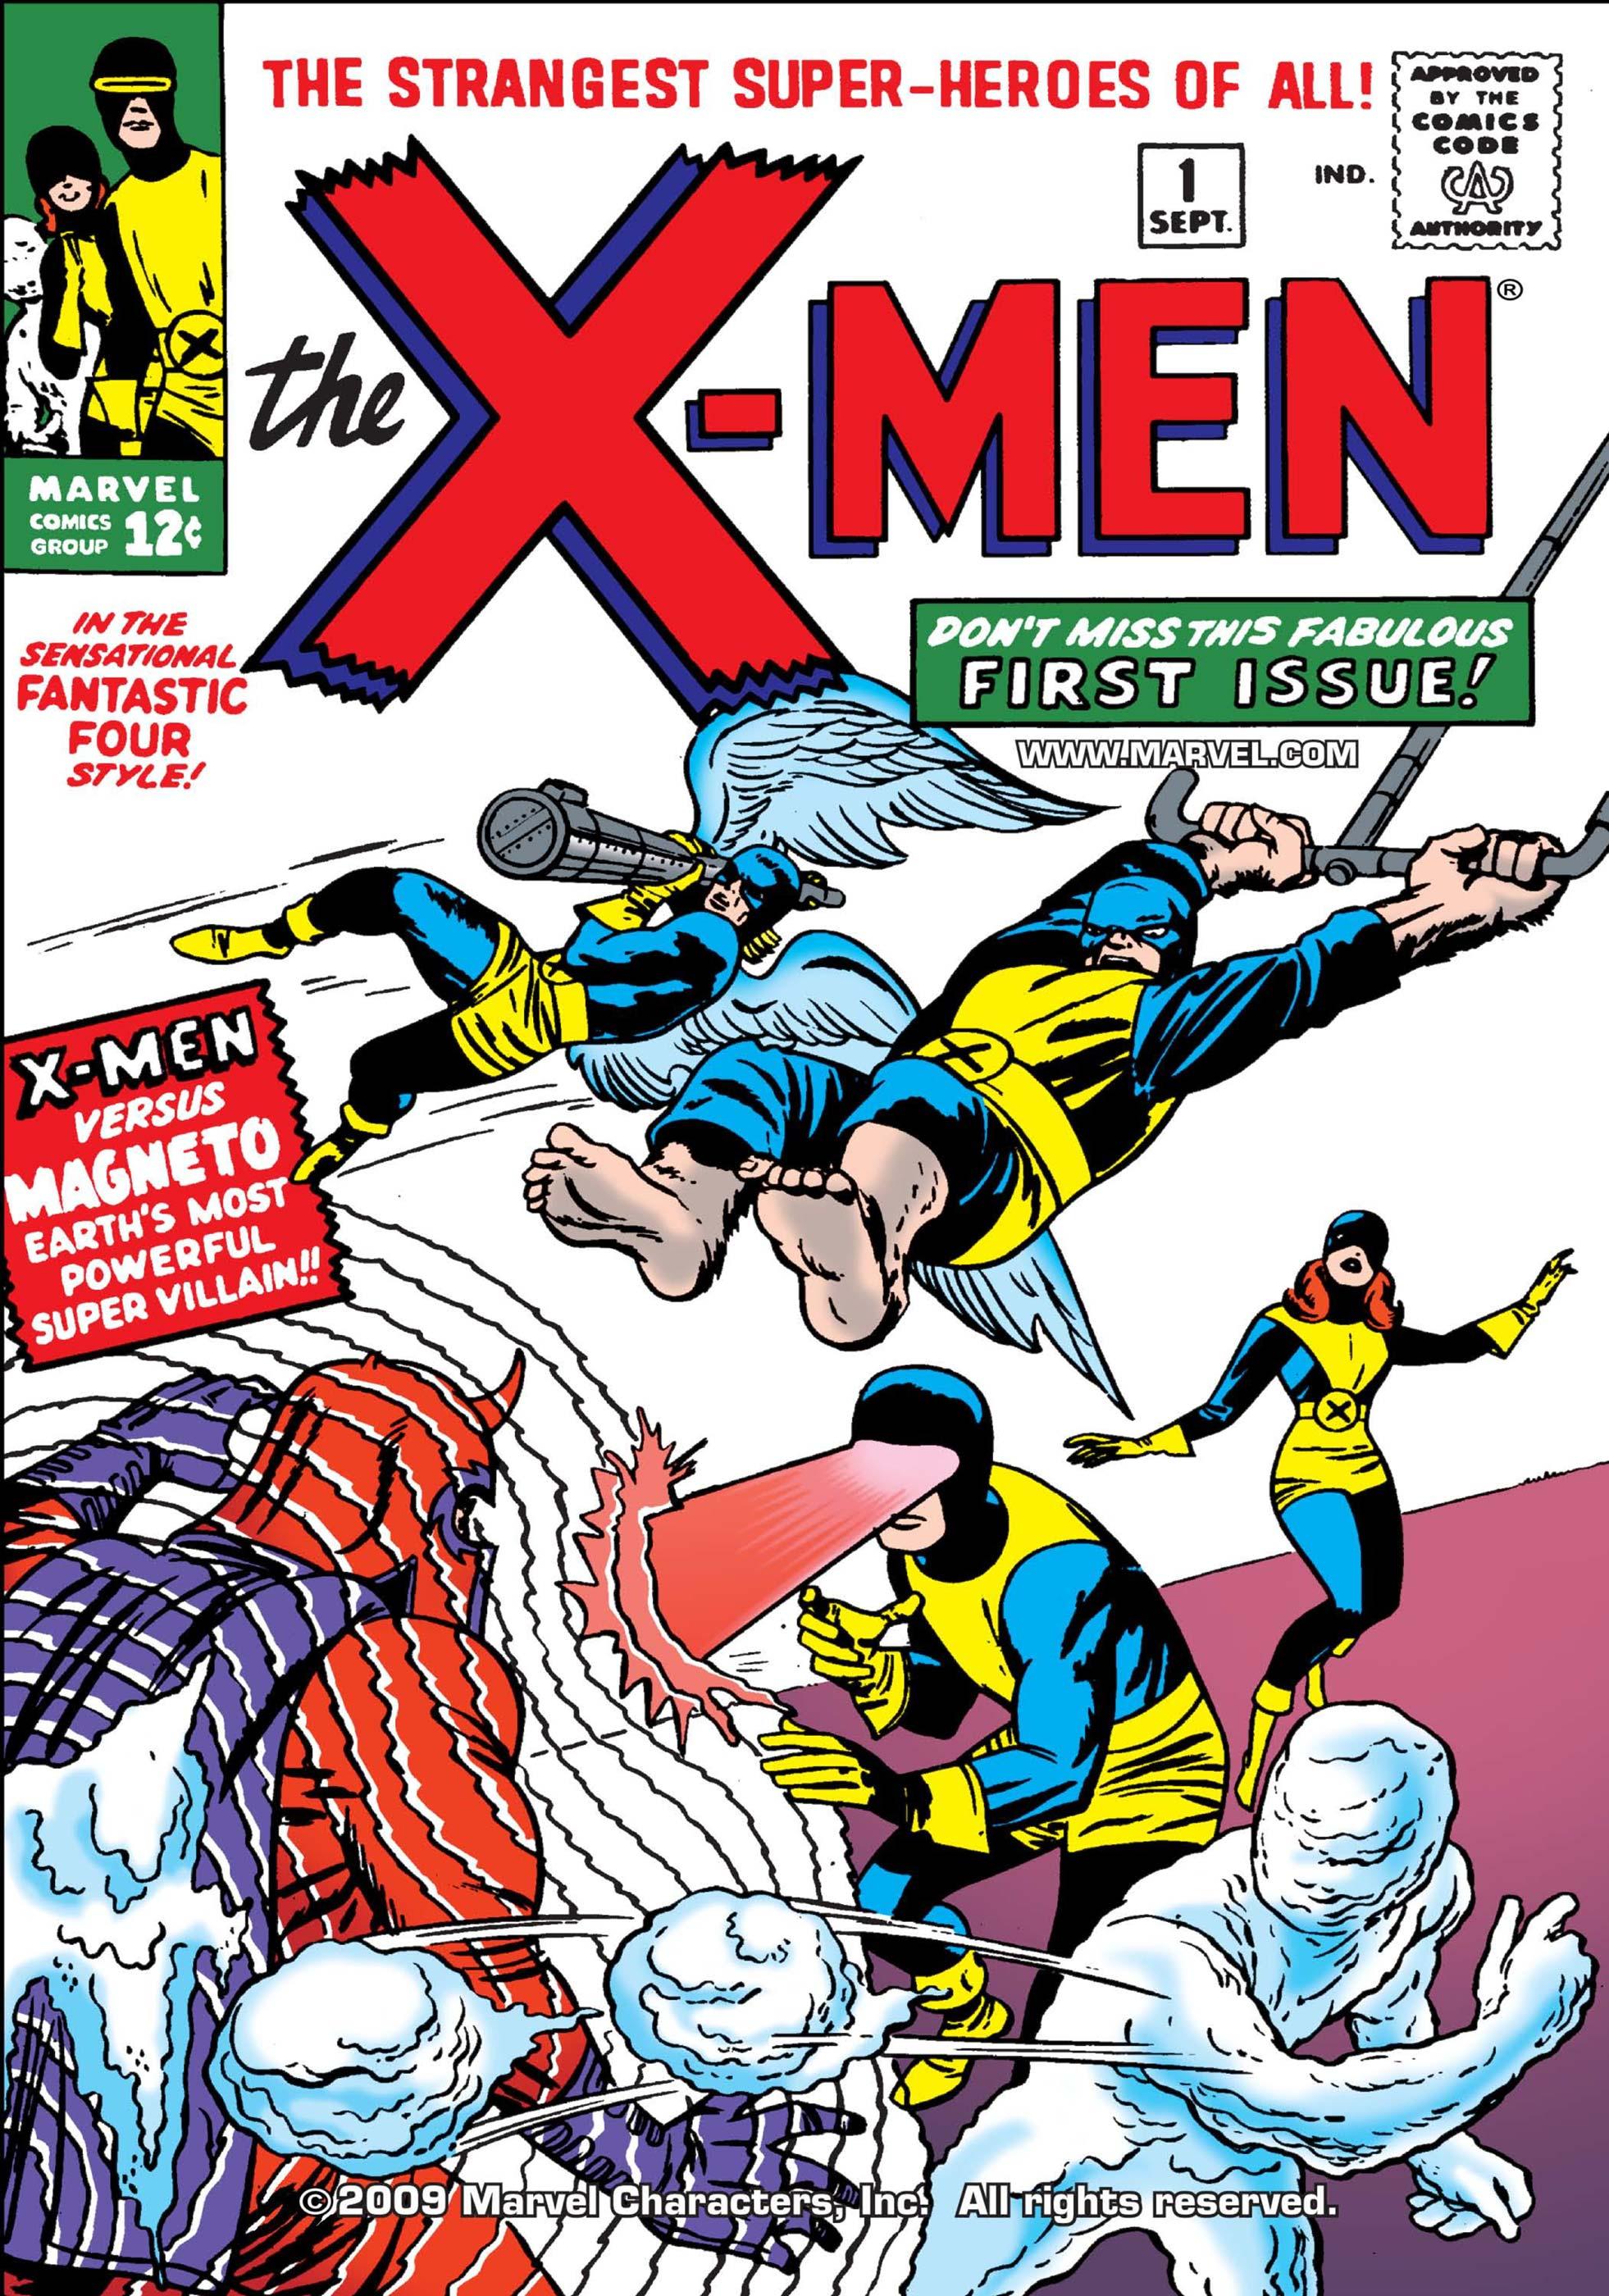 The X-Men (1963) #1 Cover